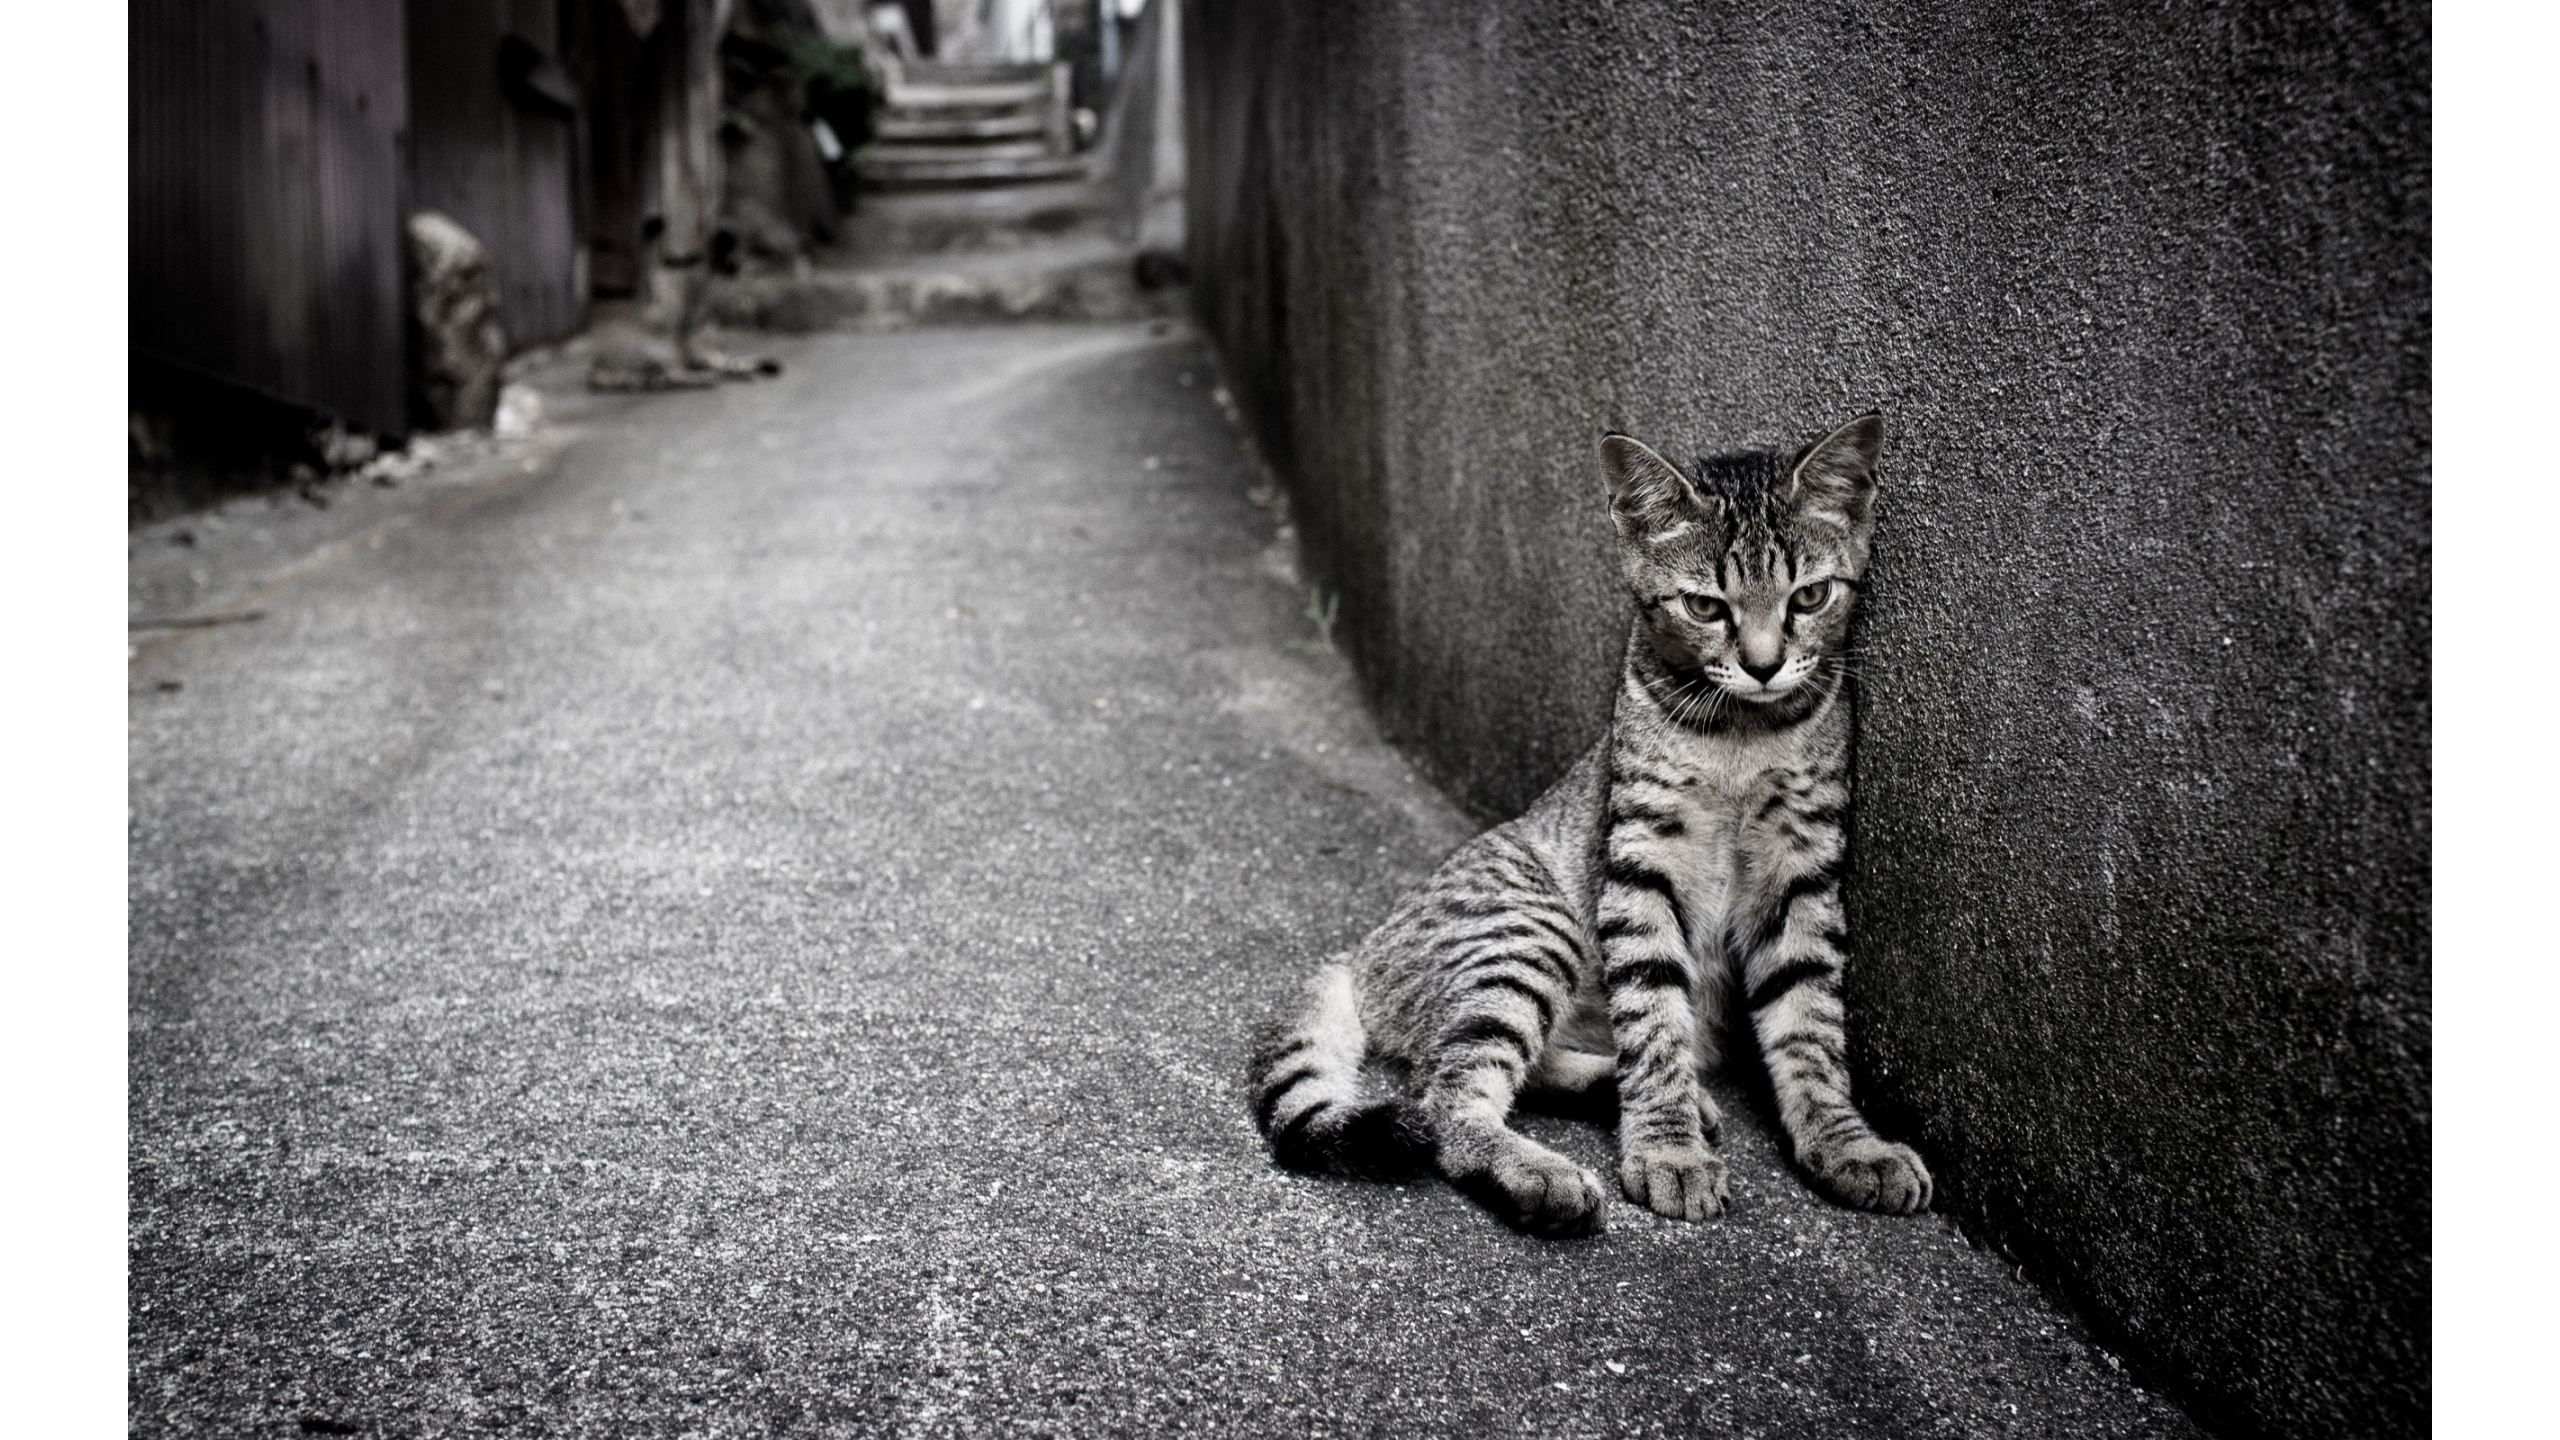 Very Sad Cat   2560x1440   1518235 2560x1440